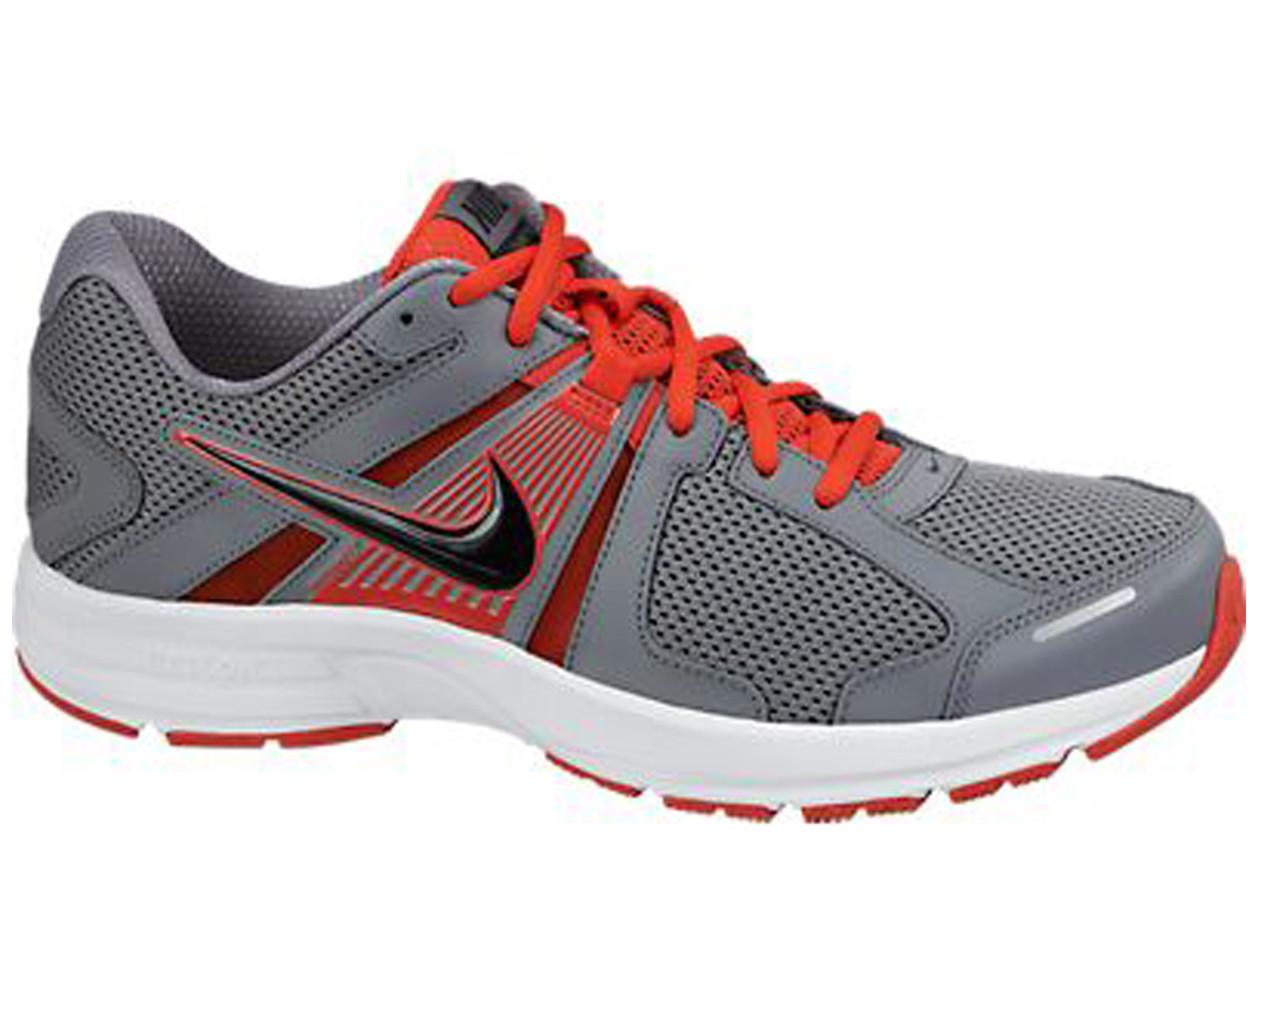 77e83796169ff Nike Men s Dart 10 Running Shoes Grey Crimson - Shop now   Shoolu.com